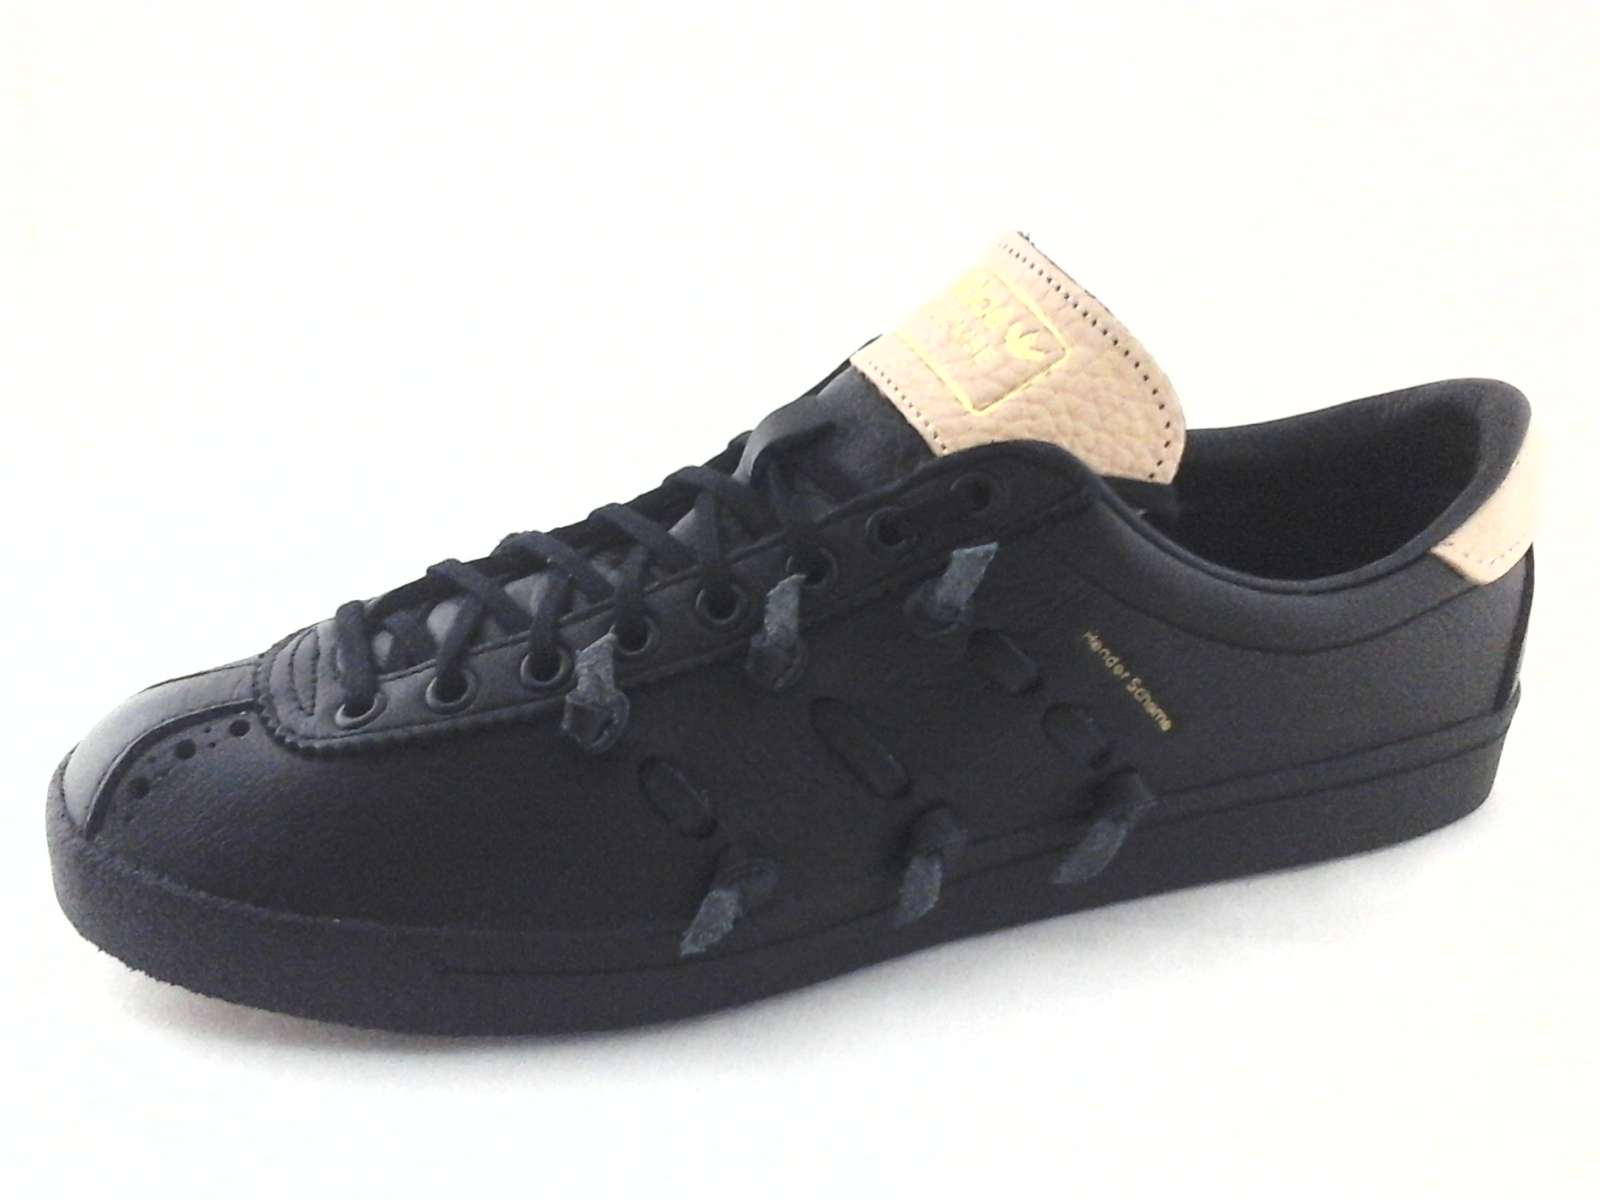 Terraplén Posibilidades Samuel  Adidas HS Lacombe Hender Scheme Black Shoes EE6014 Mens US 10 EU 44 New |  eBay